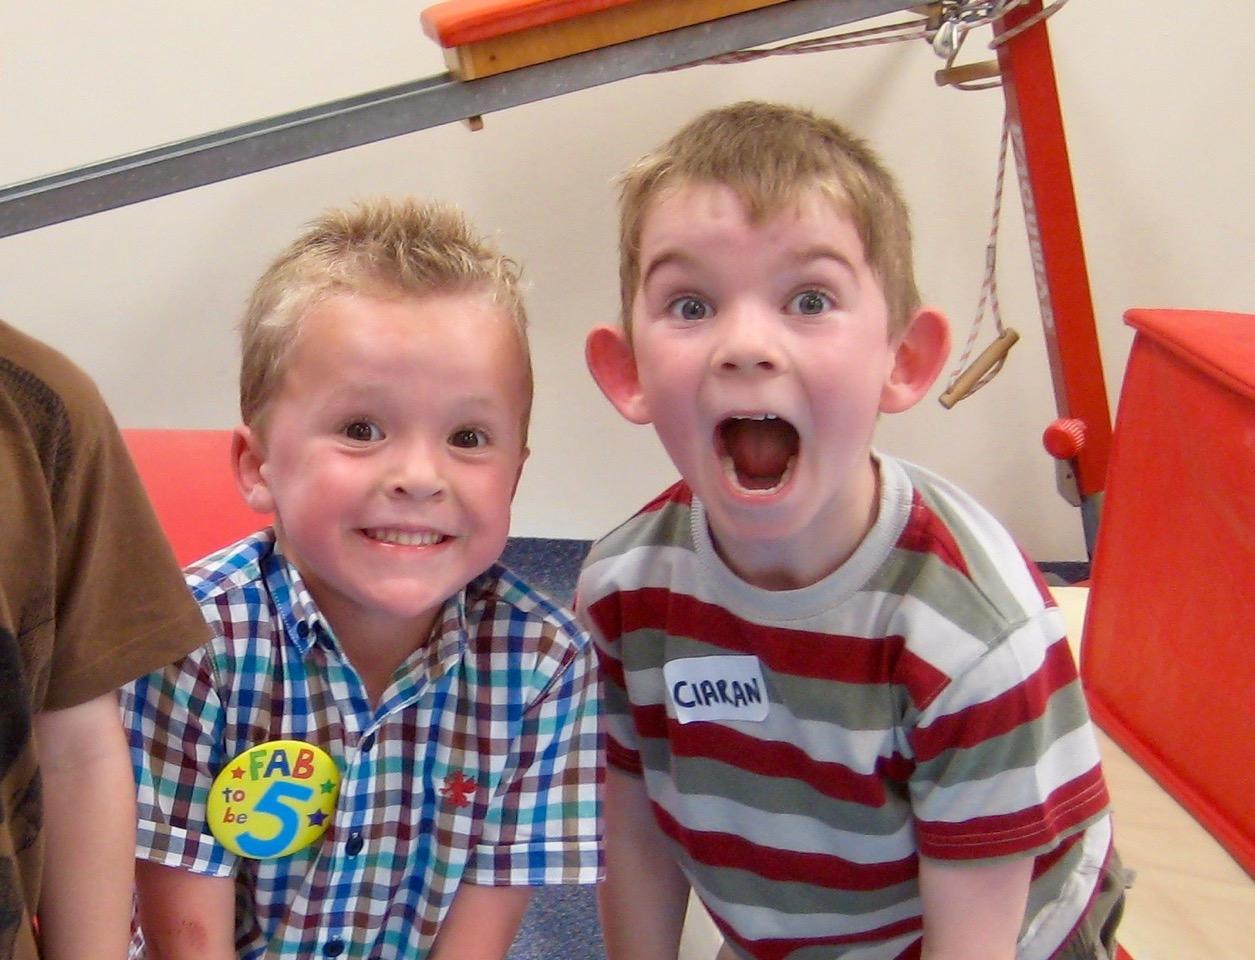 Best kids magician aylesbury, Best kids magician High Wycombe, Best kids magician Milton Keynes, Best kids magician Tring